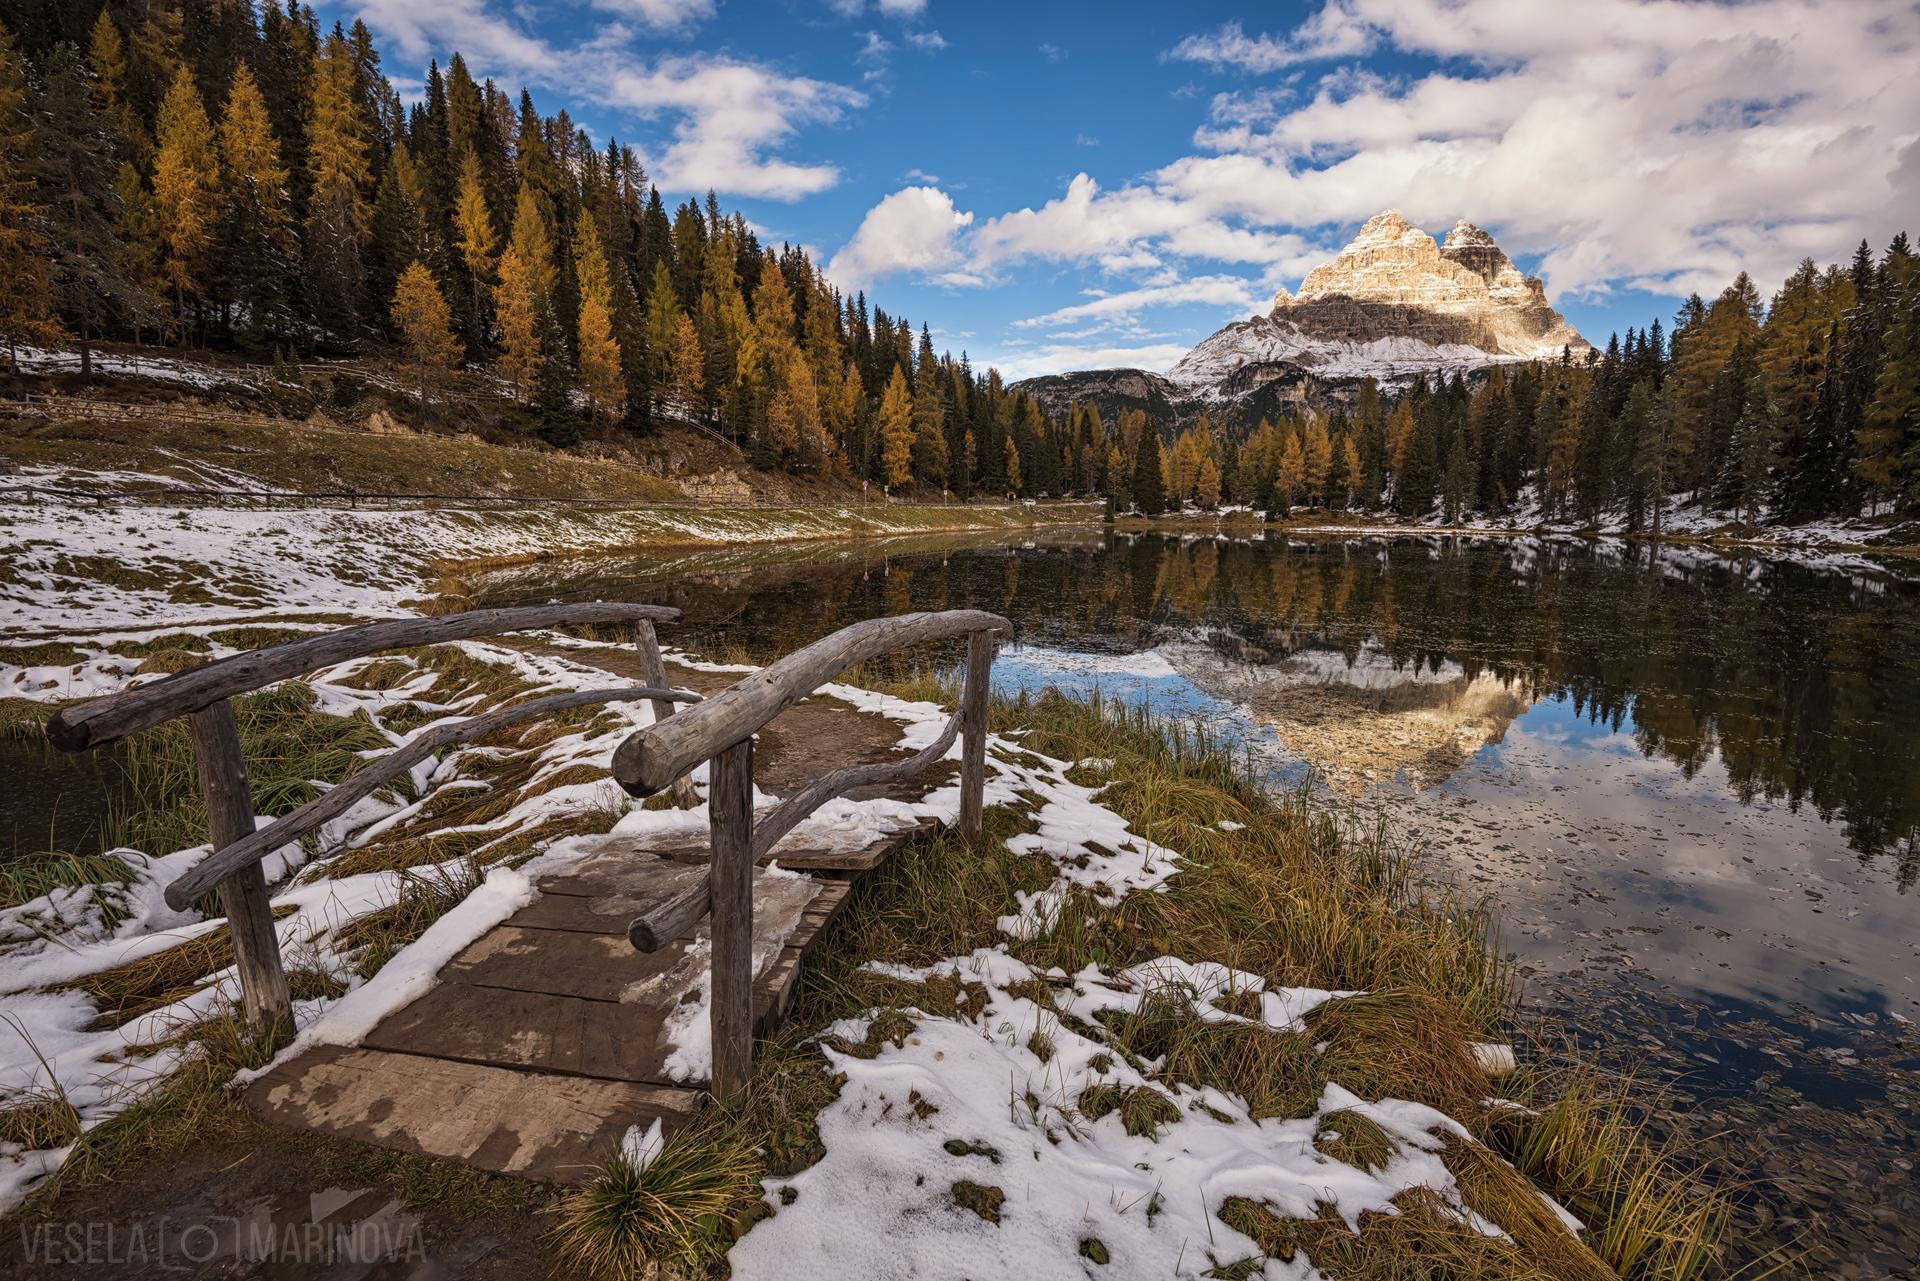 Lago d'Antorno in the Autumn, Italy